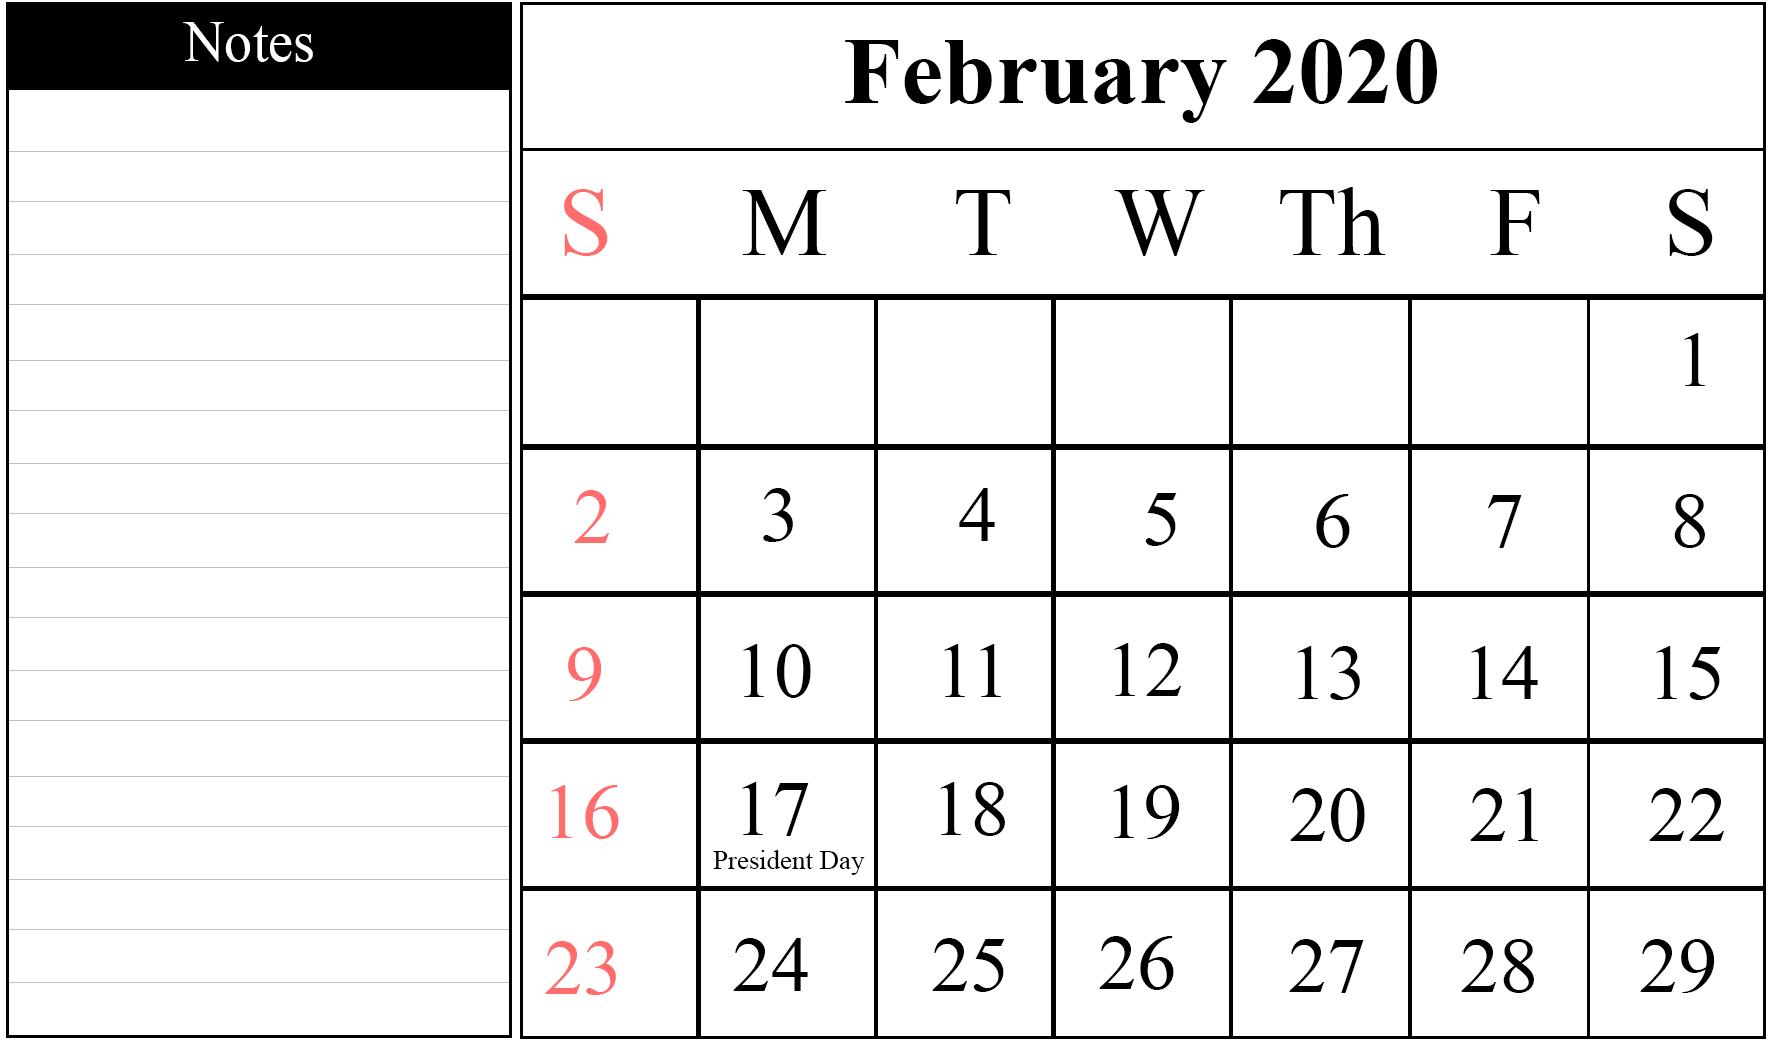 February 2020 Calendar Template